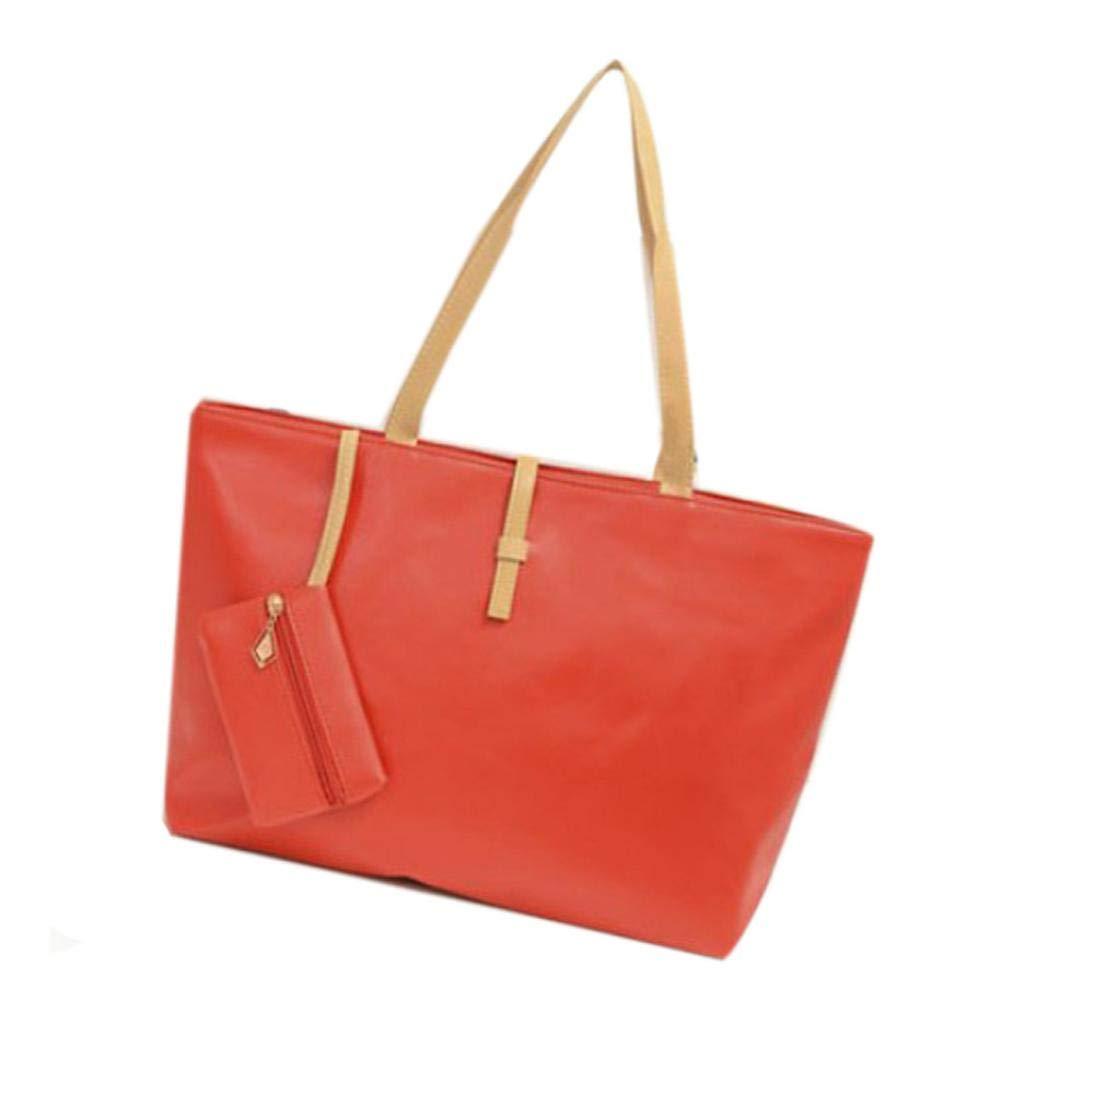 e94542cc82 Amazon.com  Elogoog Women Handbag Stylish Faux PU Leather Shoulder Bag  Casual Ladies Tote Bag Satchel Shopper Bag (Black)  Sports   Outdoors